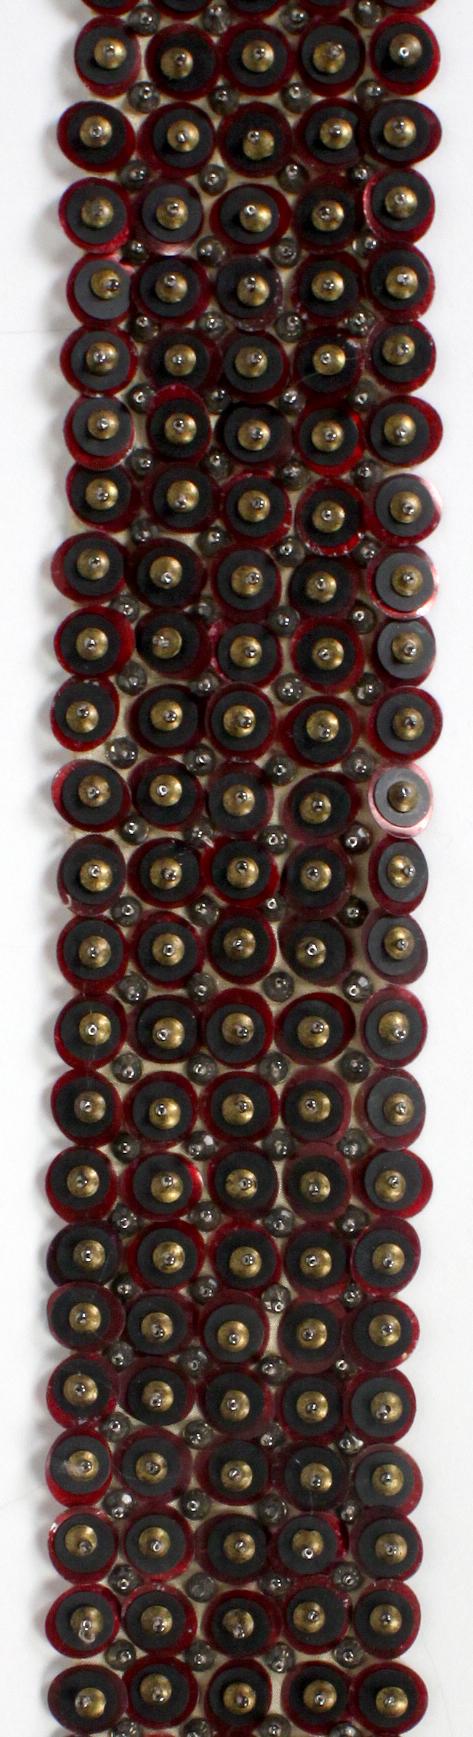 SS-6580-T-RD.jpg